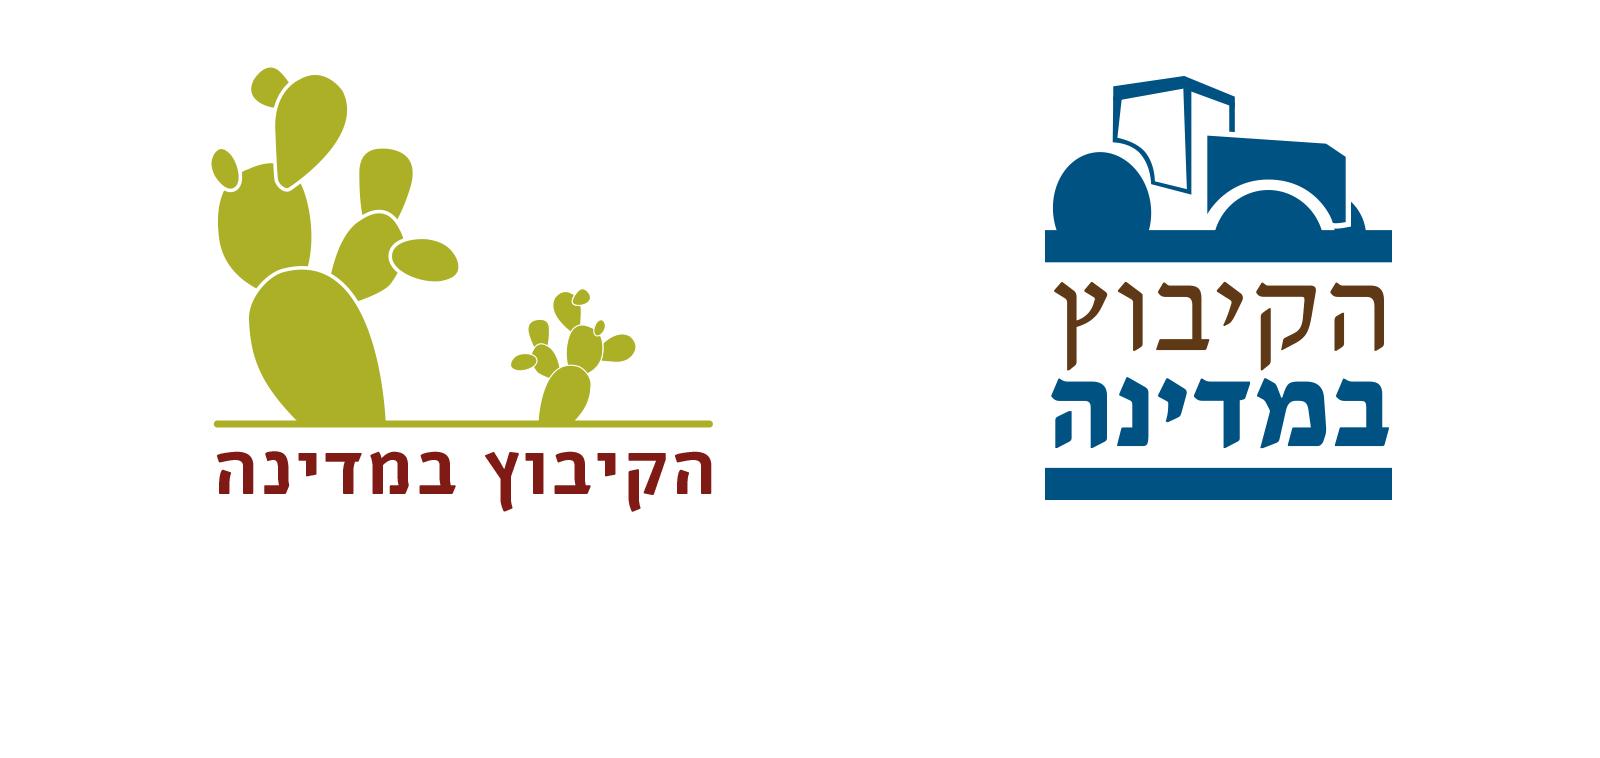 https://bigeyes.co.il/wp-content/uploads/2019/06/KibbutzBooks-logo-3.png